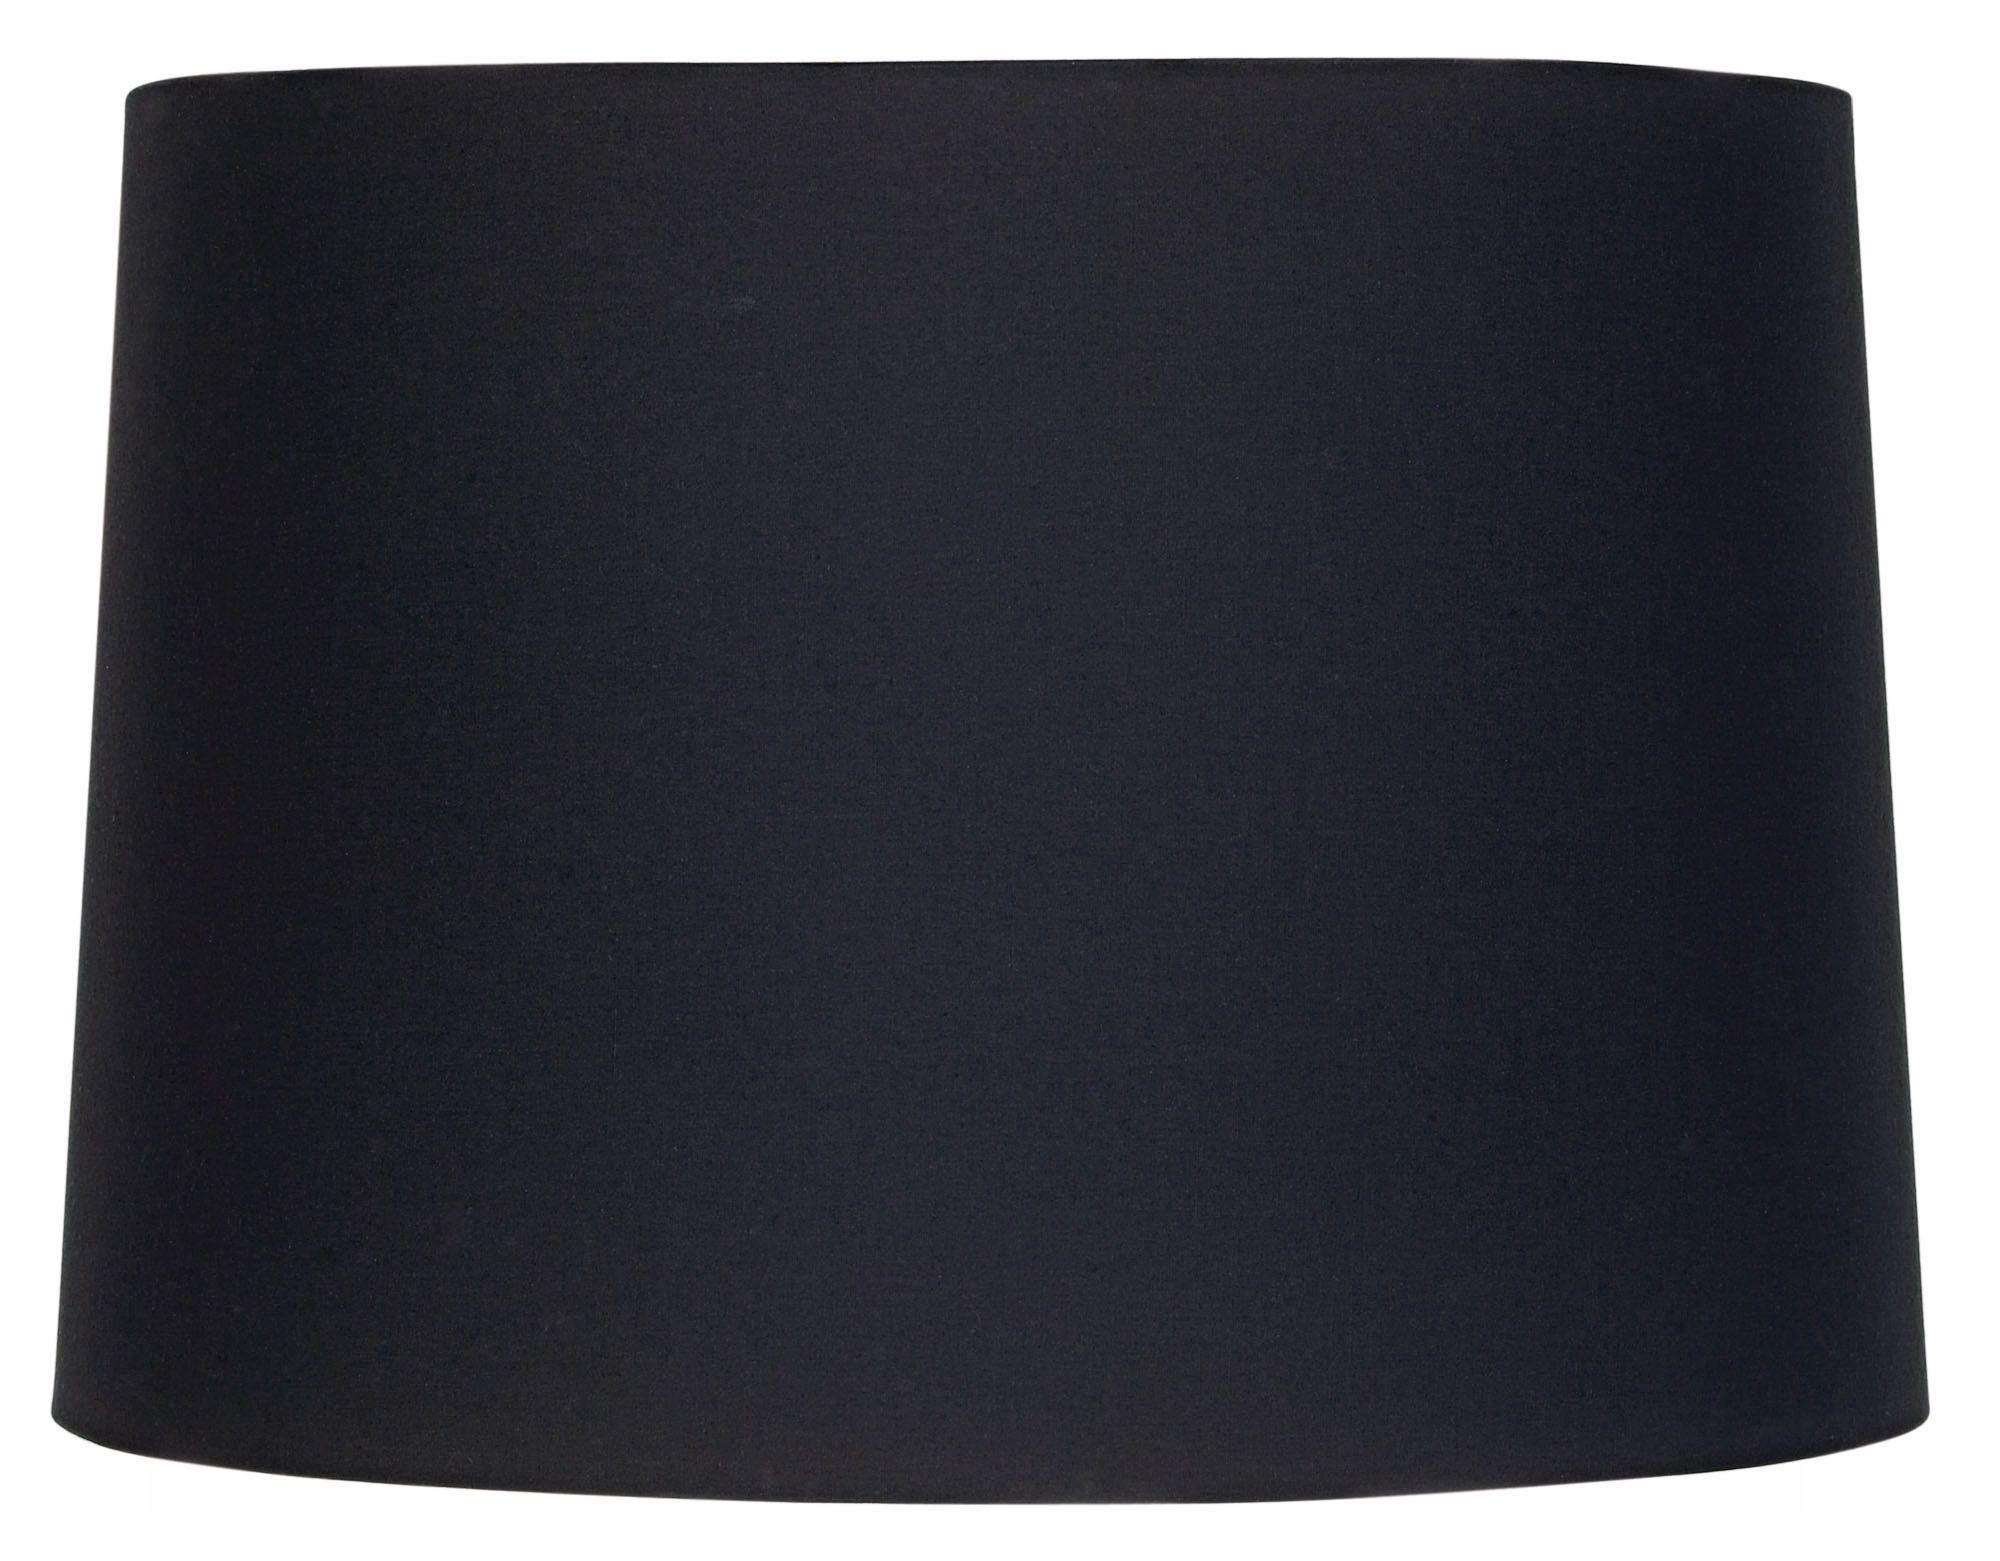 black fabric drum shade 11x12x85 spider